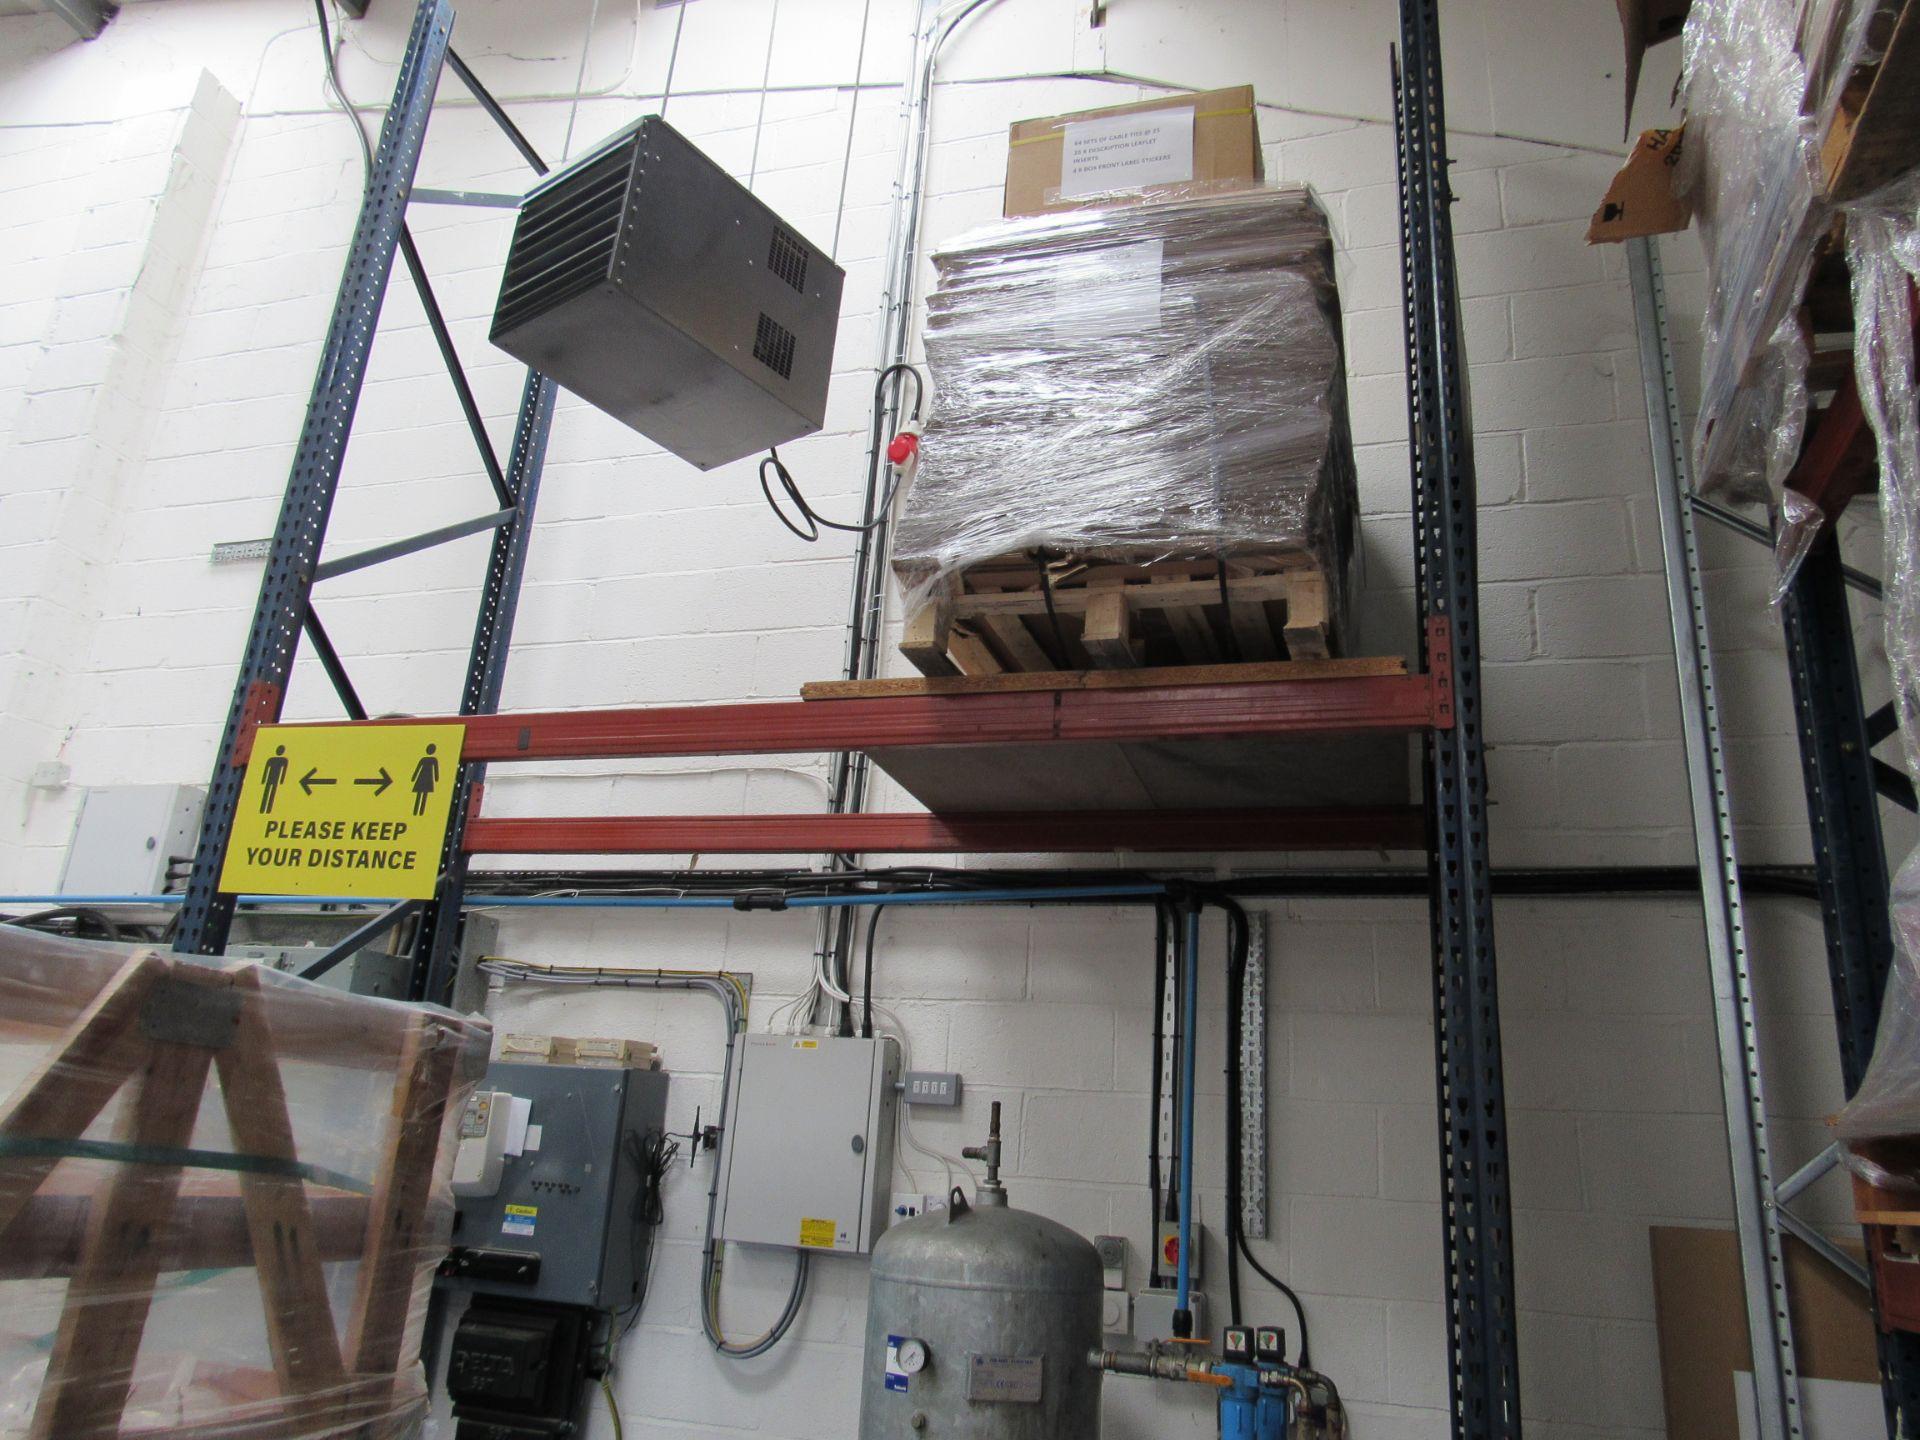 3 Bays Warehouse Racking, 5 End Frames, 20 Cross Beams - Image 3 of 3